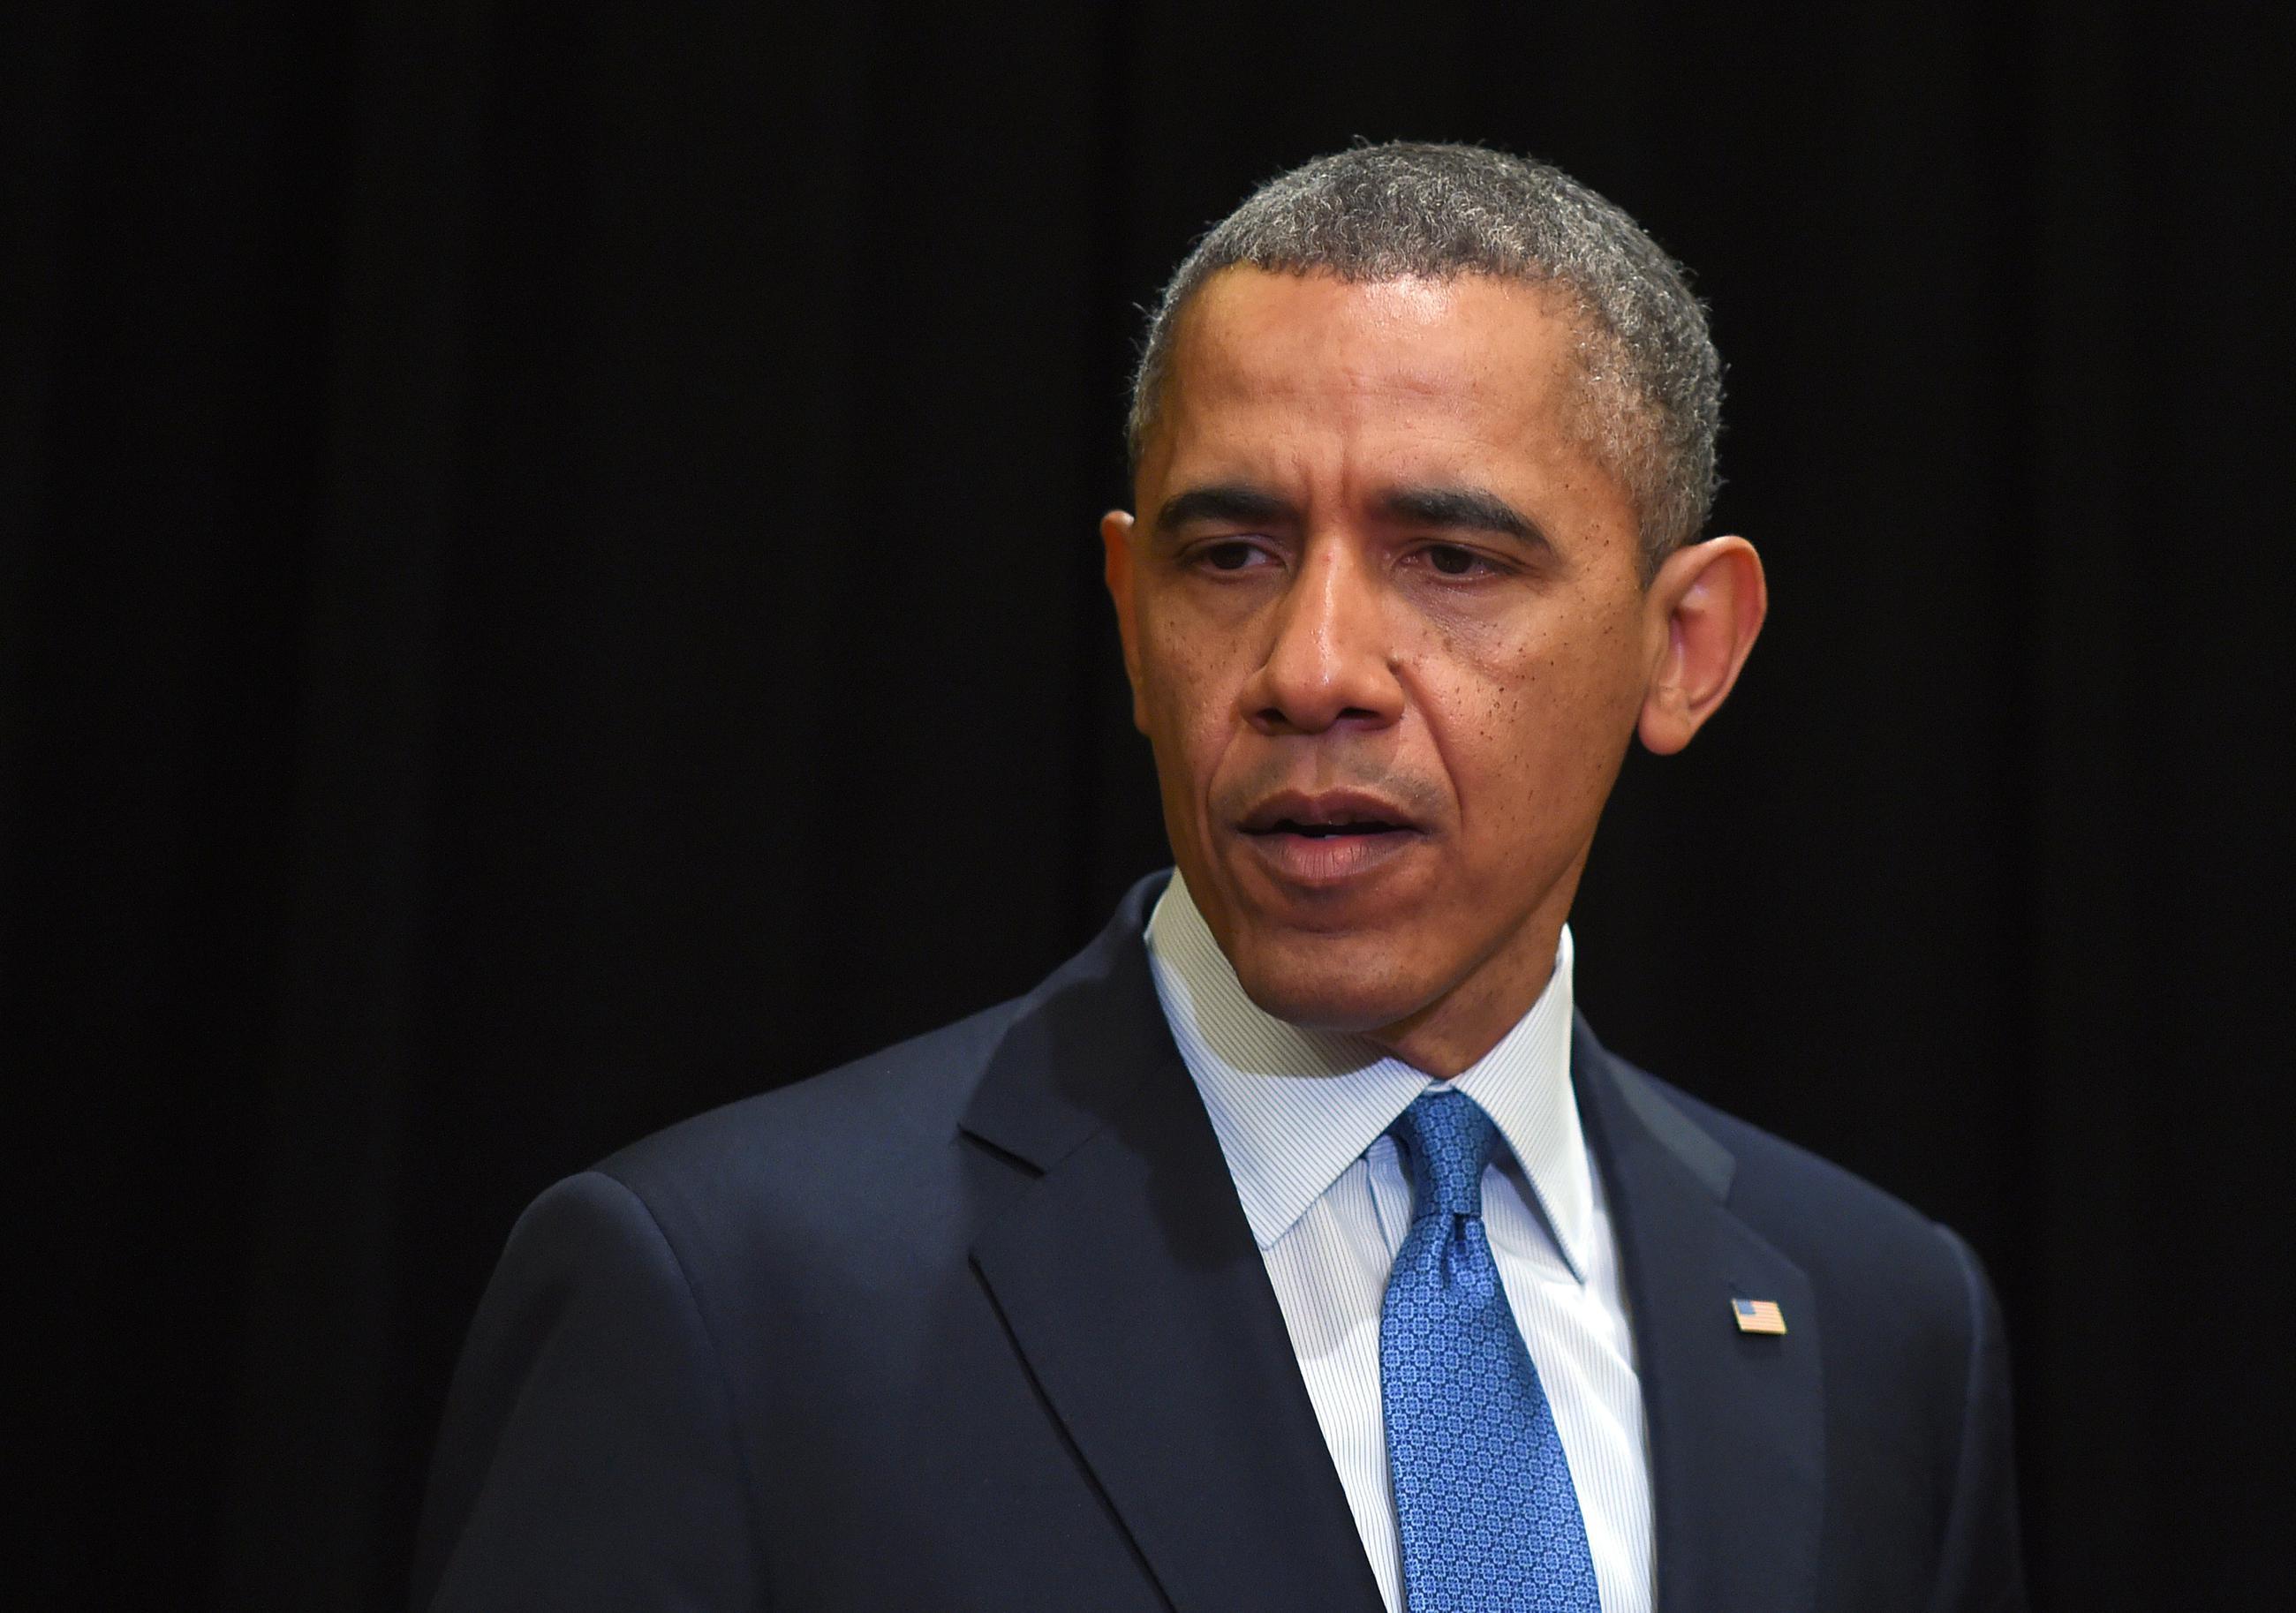 Poll Shows Problems for Obama, Peril for Senate Democrats